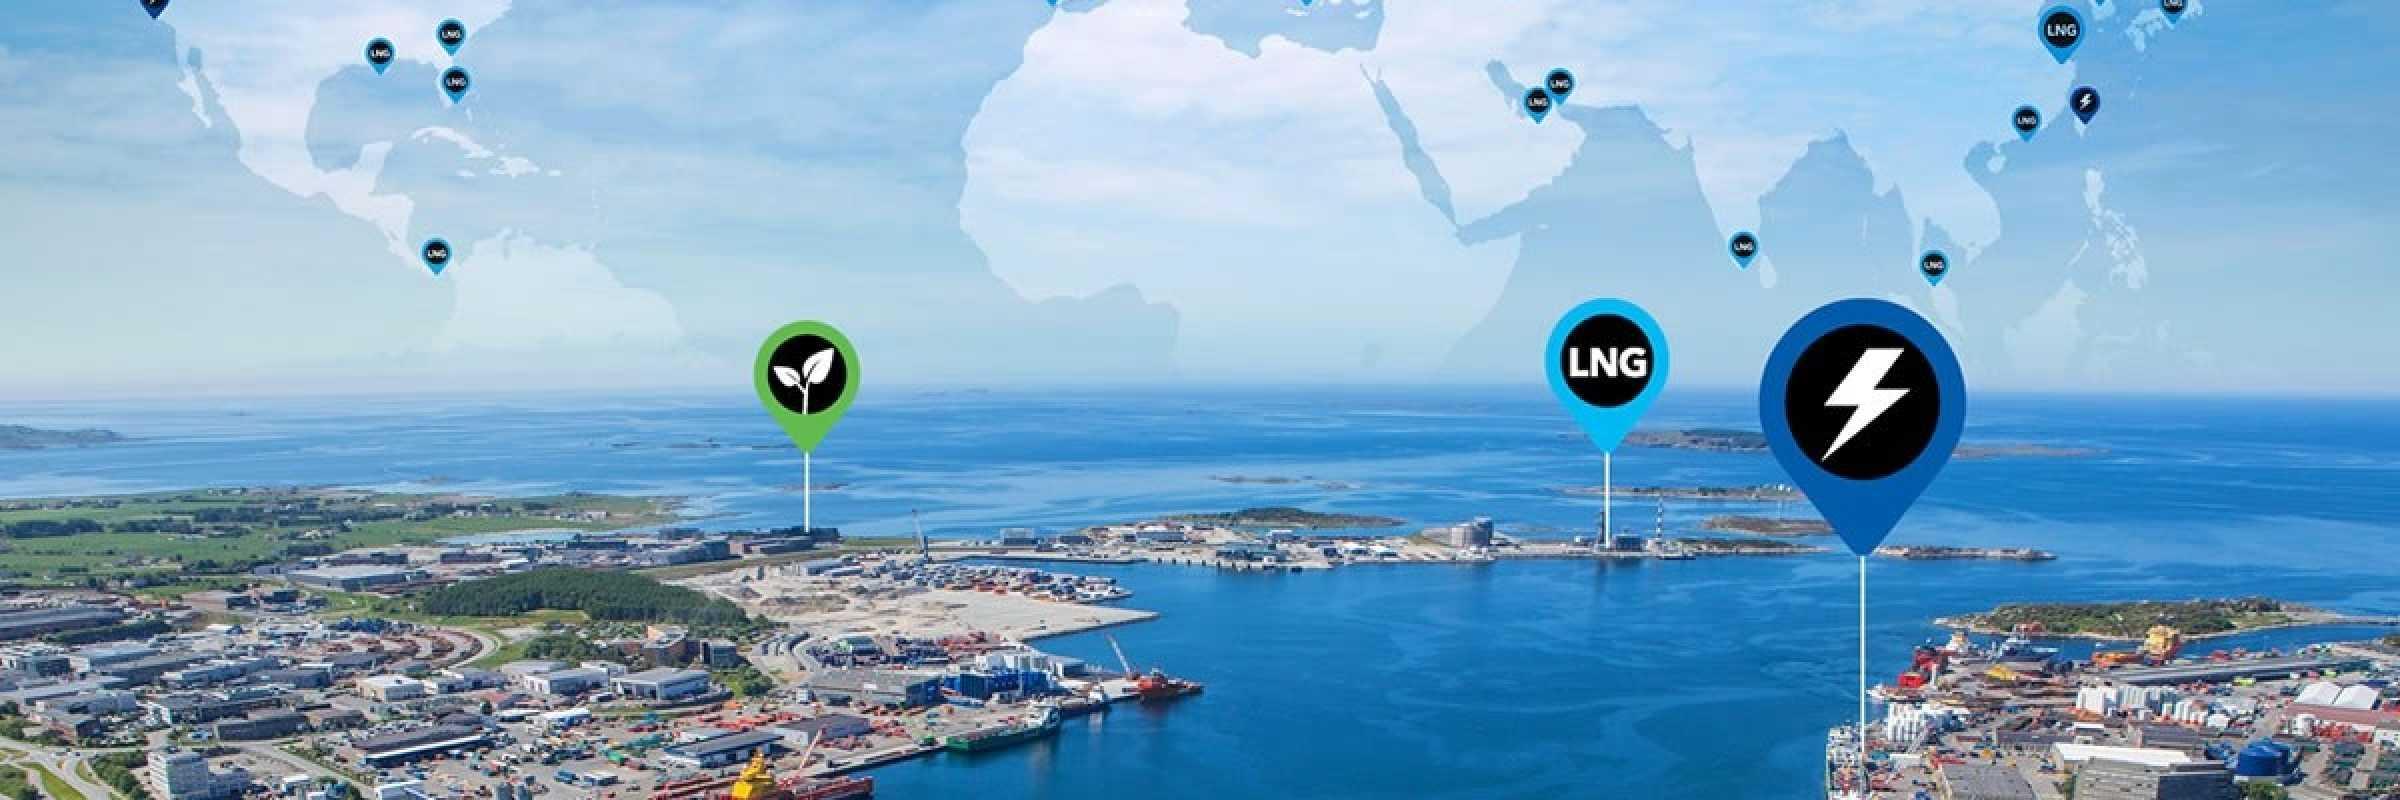 DNV GL launches Alternative Fuels Insight (AFI) platform